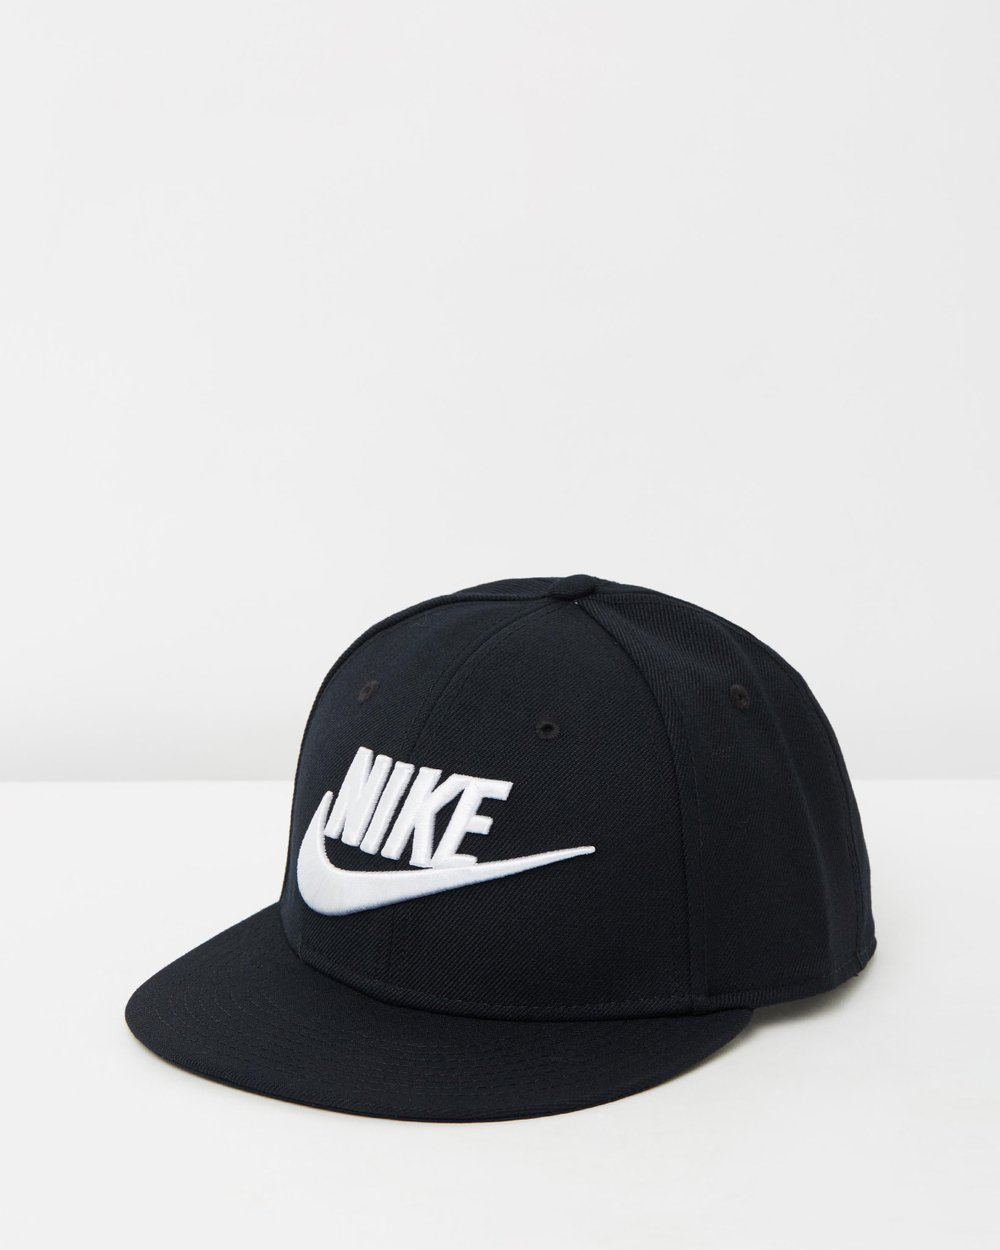 b6a75be531d Futura Nike True Cap by Nike Online